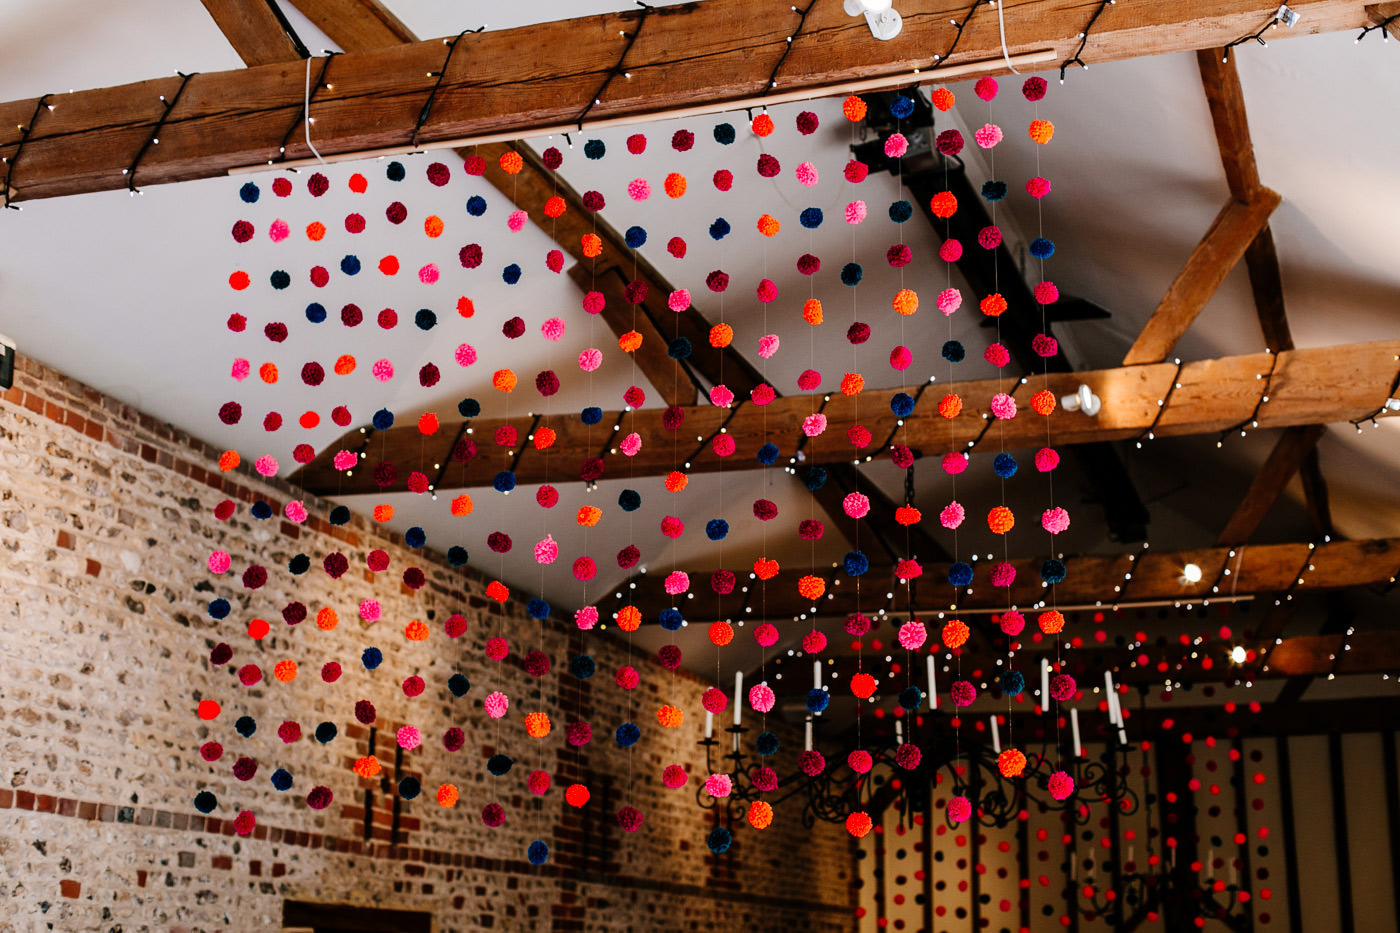 colourful-upwaltham-barns-sussex-wedding-photographer-020